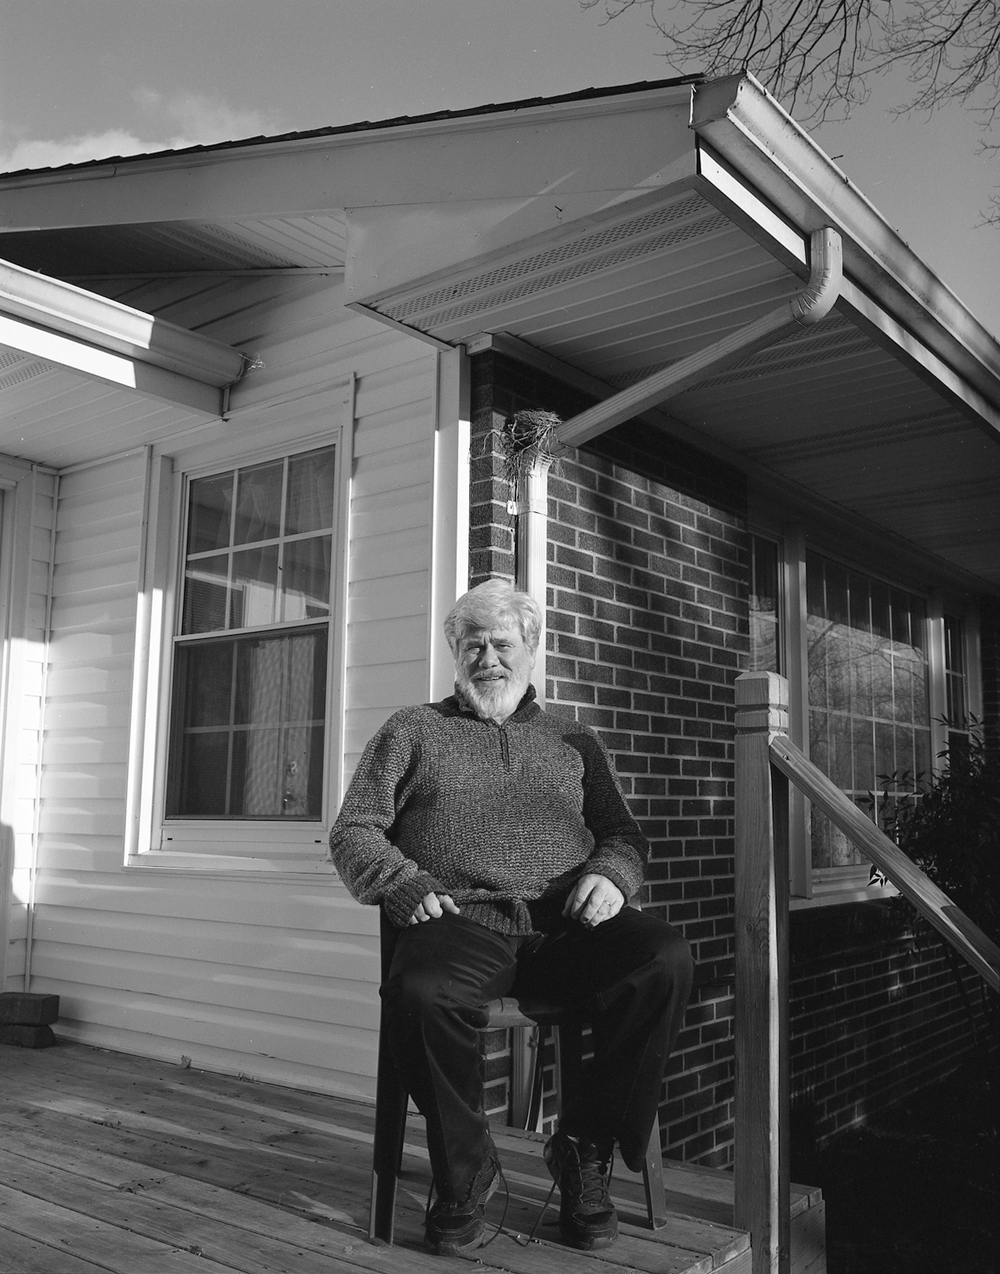 Father. Johnson City, TN. 2013.